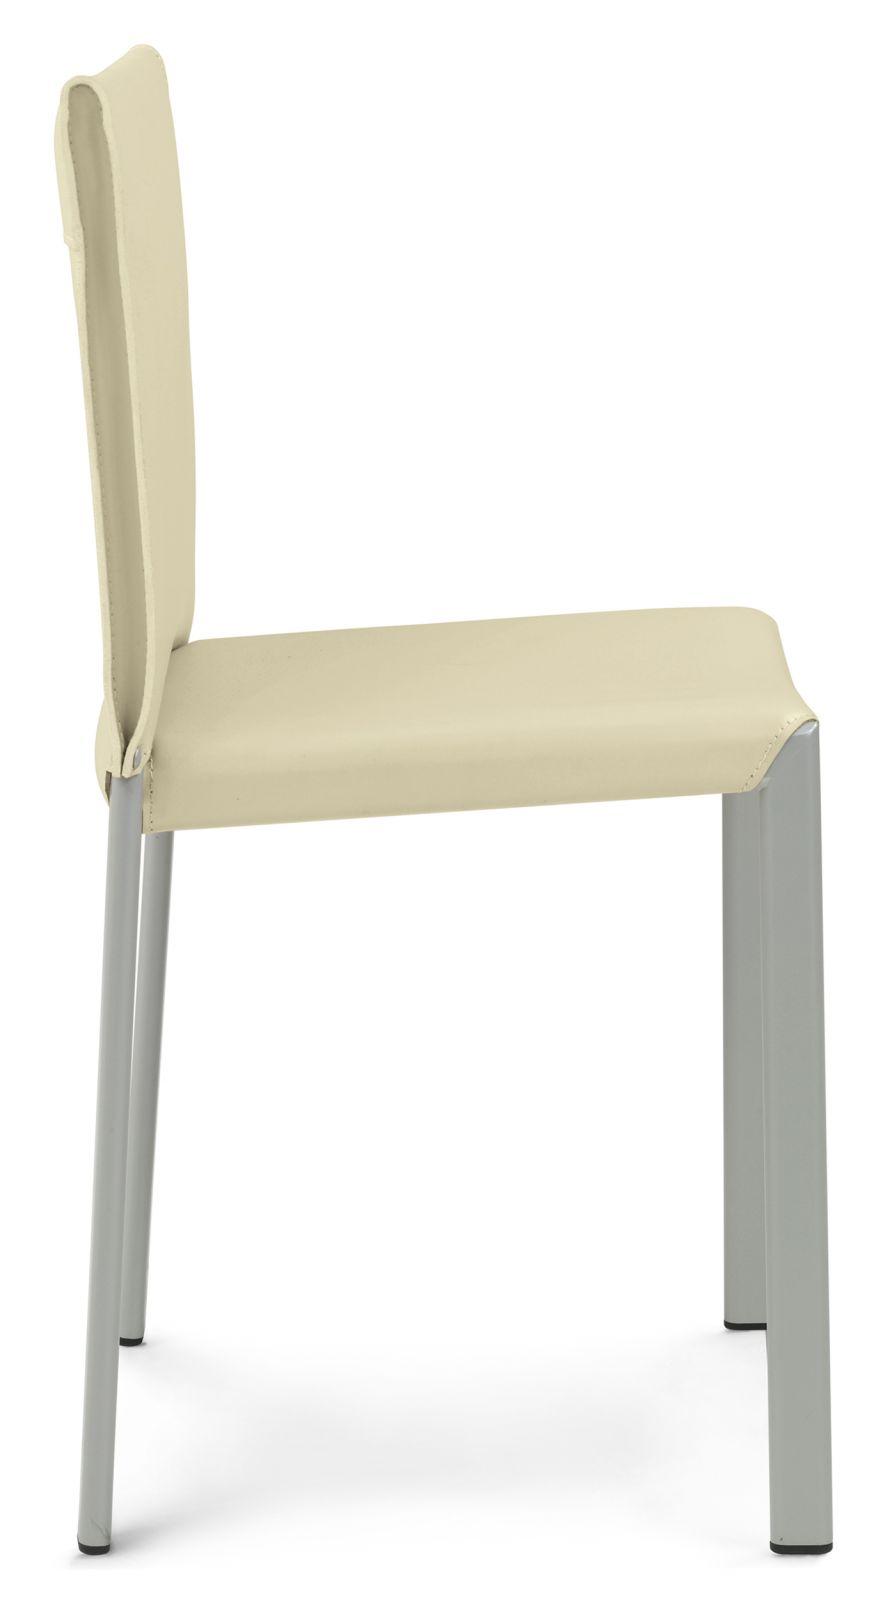 modern-office-furniture-chairs-Italian-designer-furniture (9).jpg